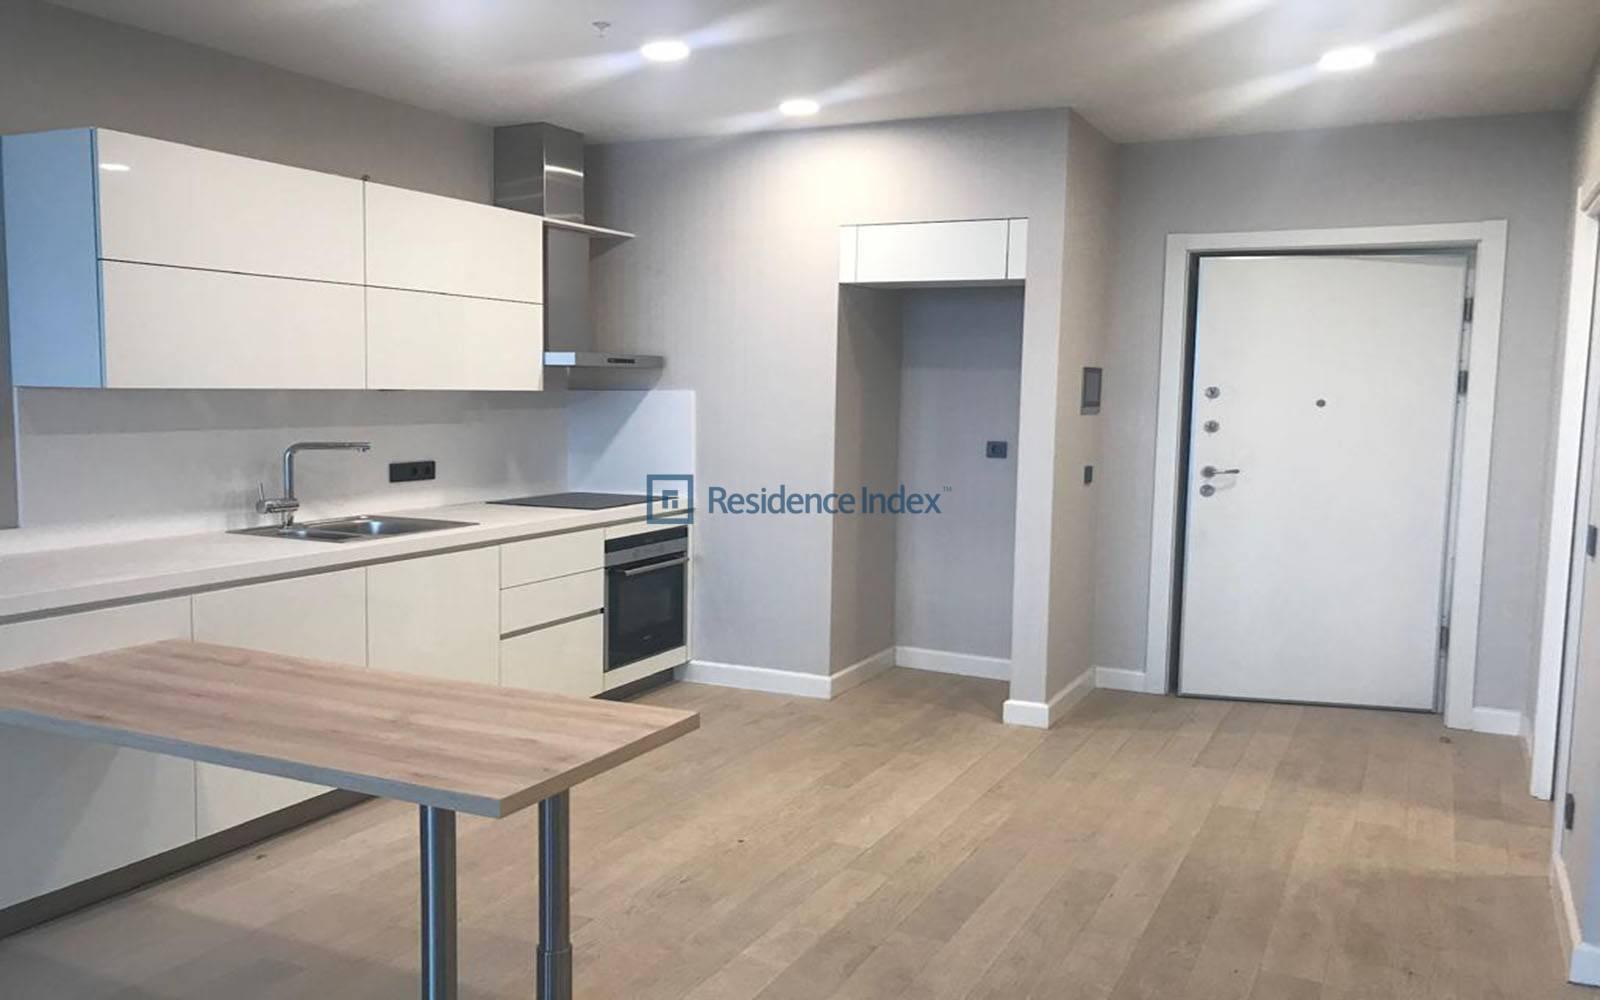 Skyland - 1 + 1 apartment for sale